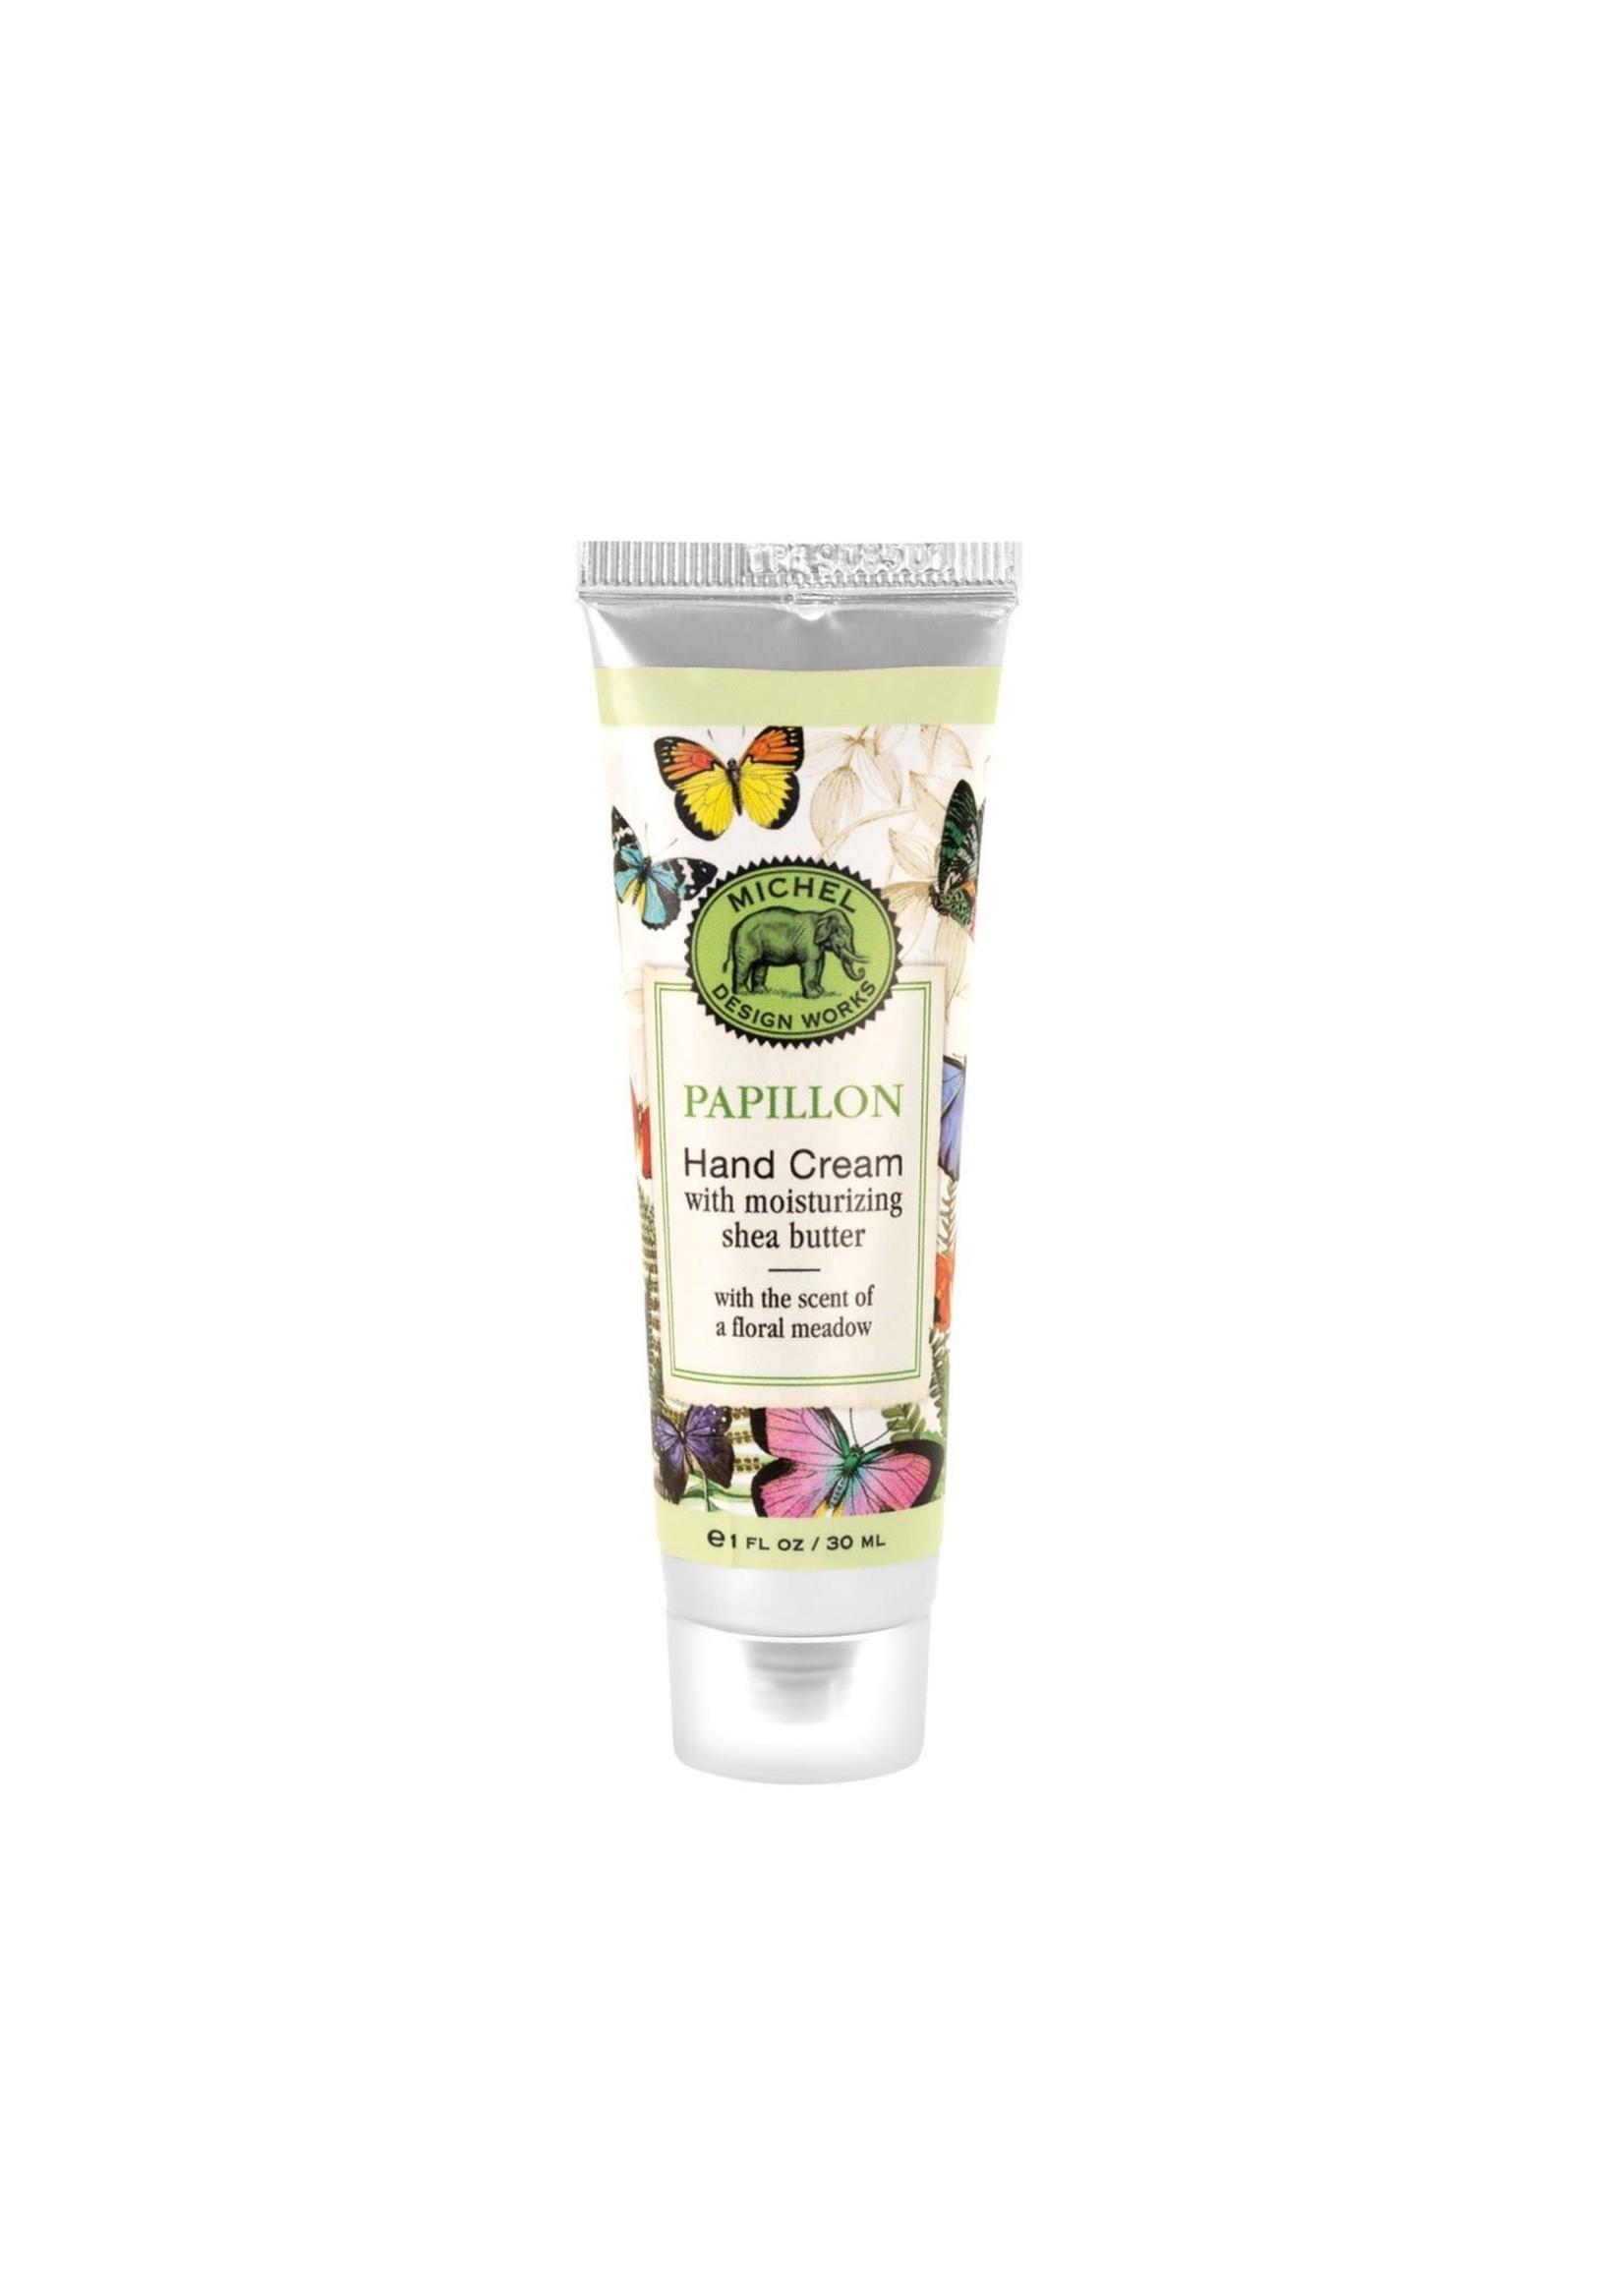 Papillon Hand Cream